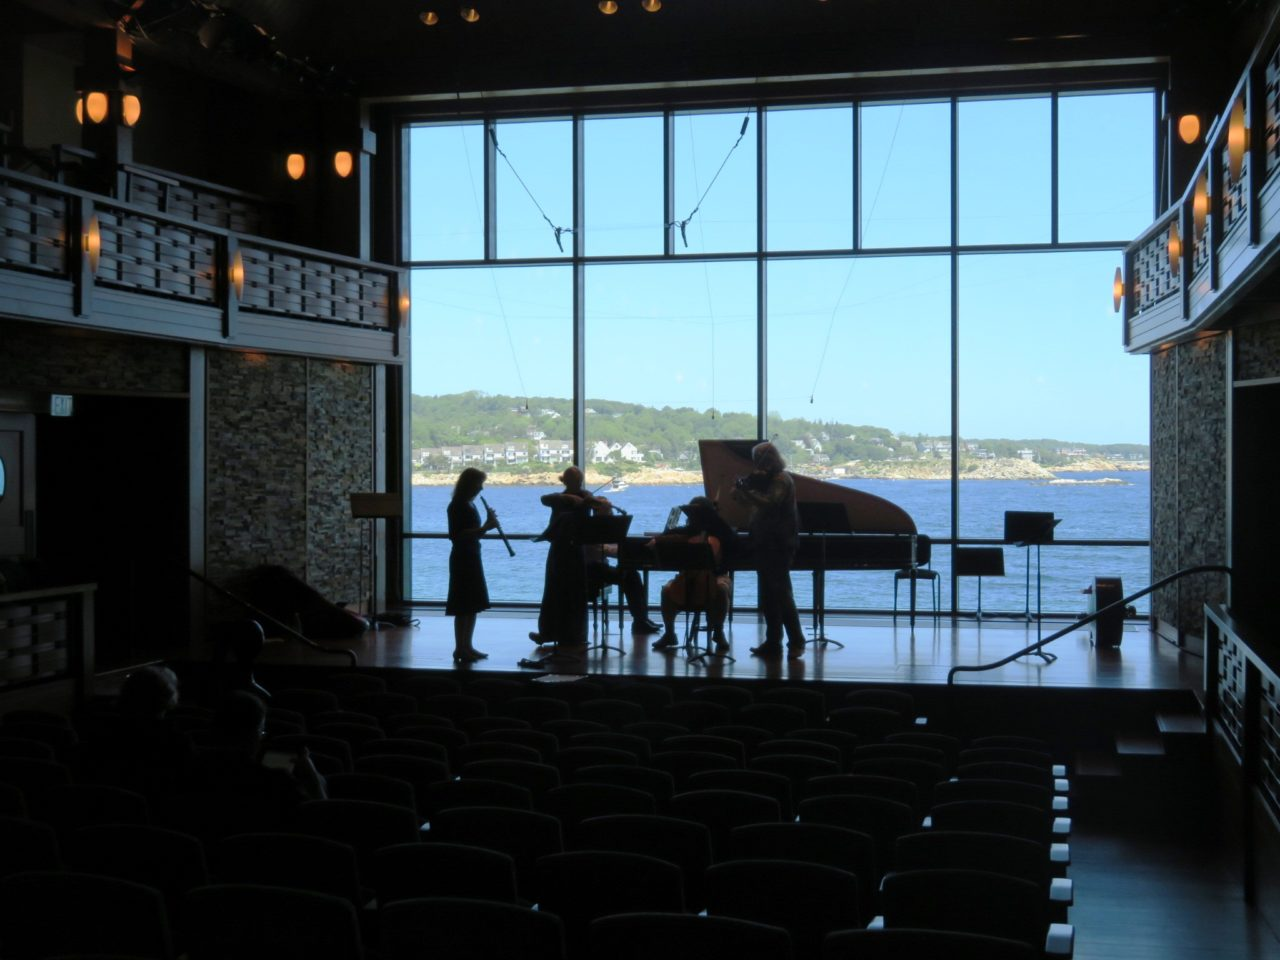 Emerson Inn by the Sea : Shalin Liu Performance Center in Rockport MA